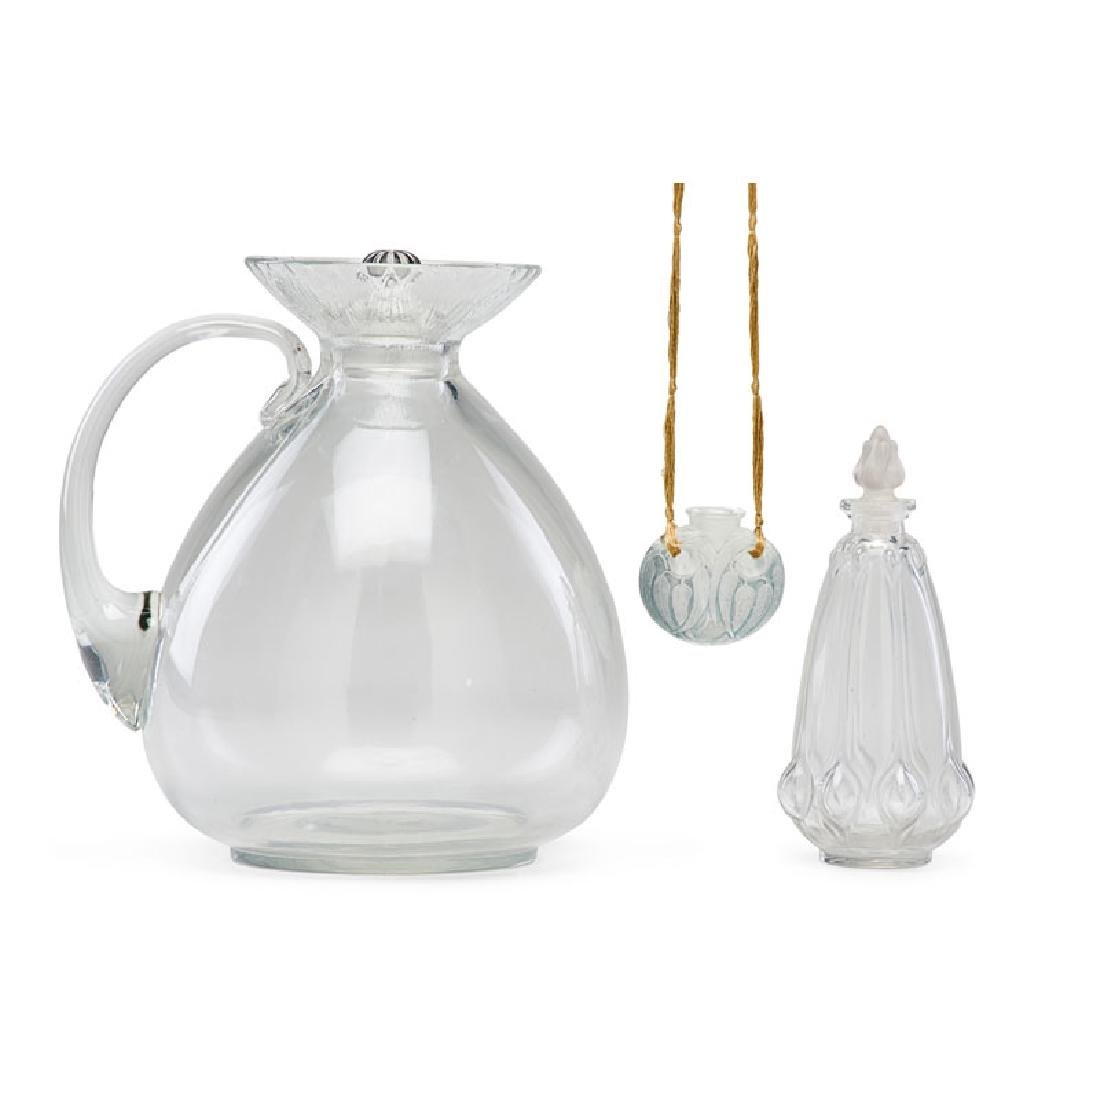 LALIQUE Perfume bottle, pendant, and decanter